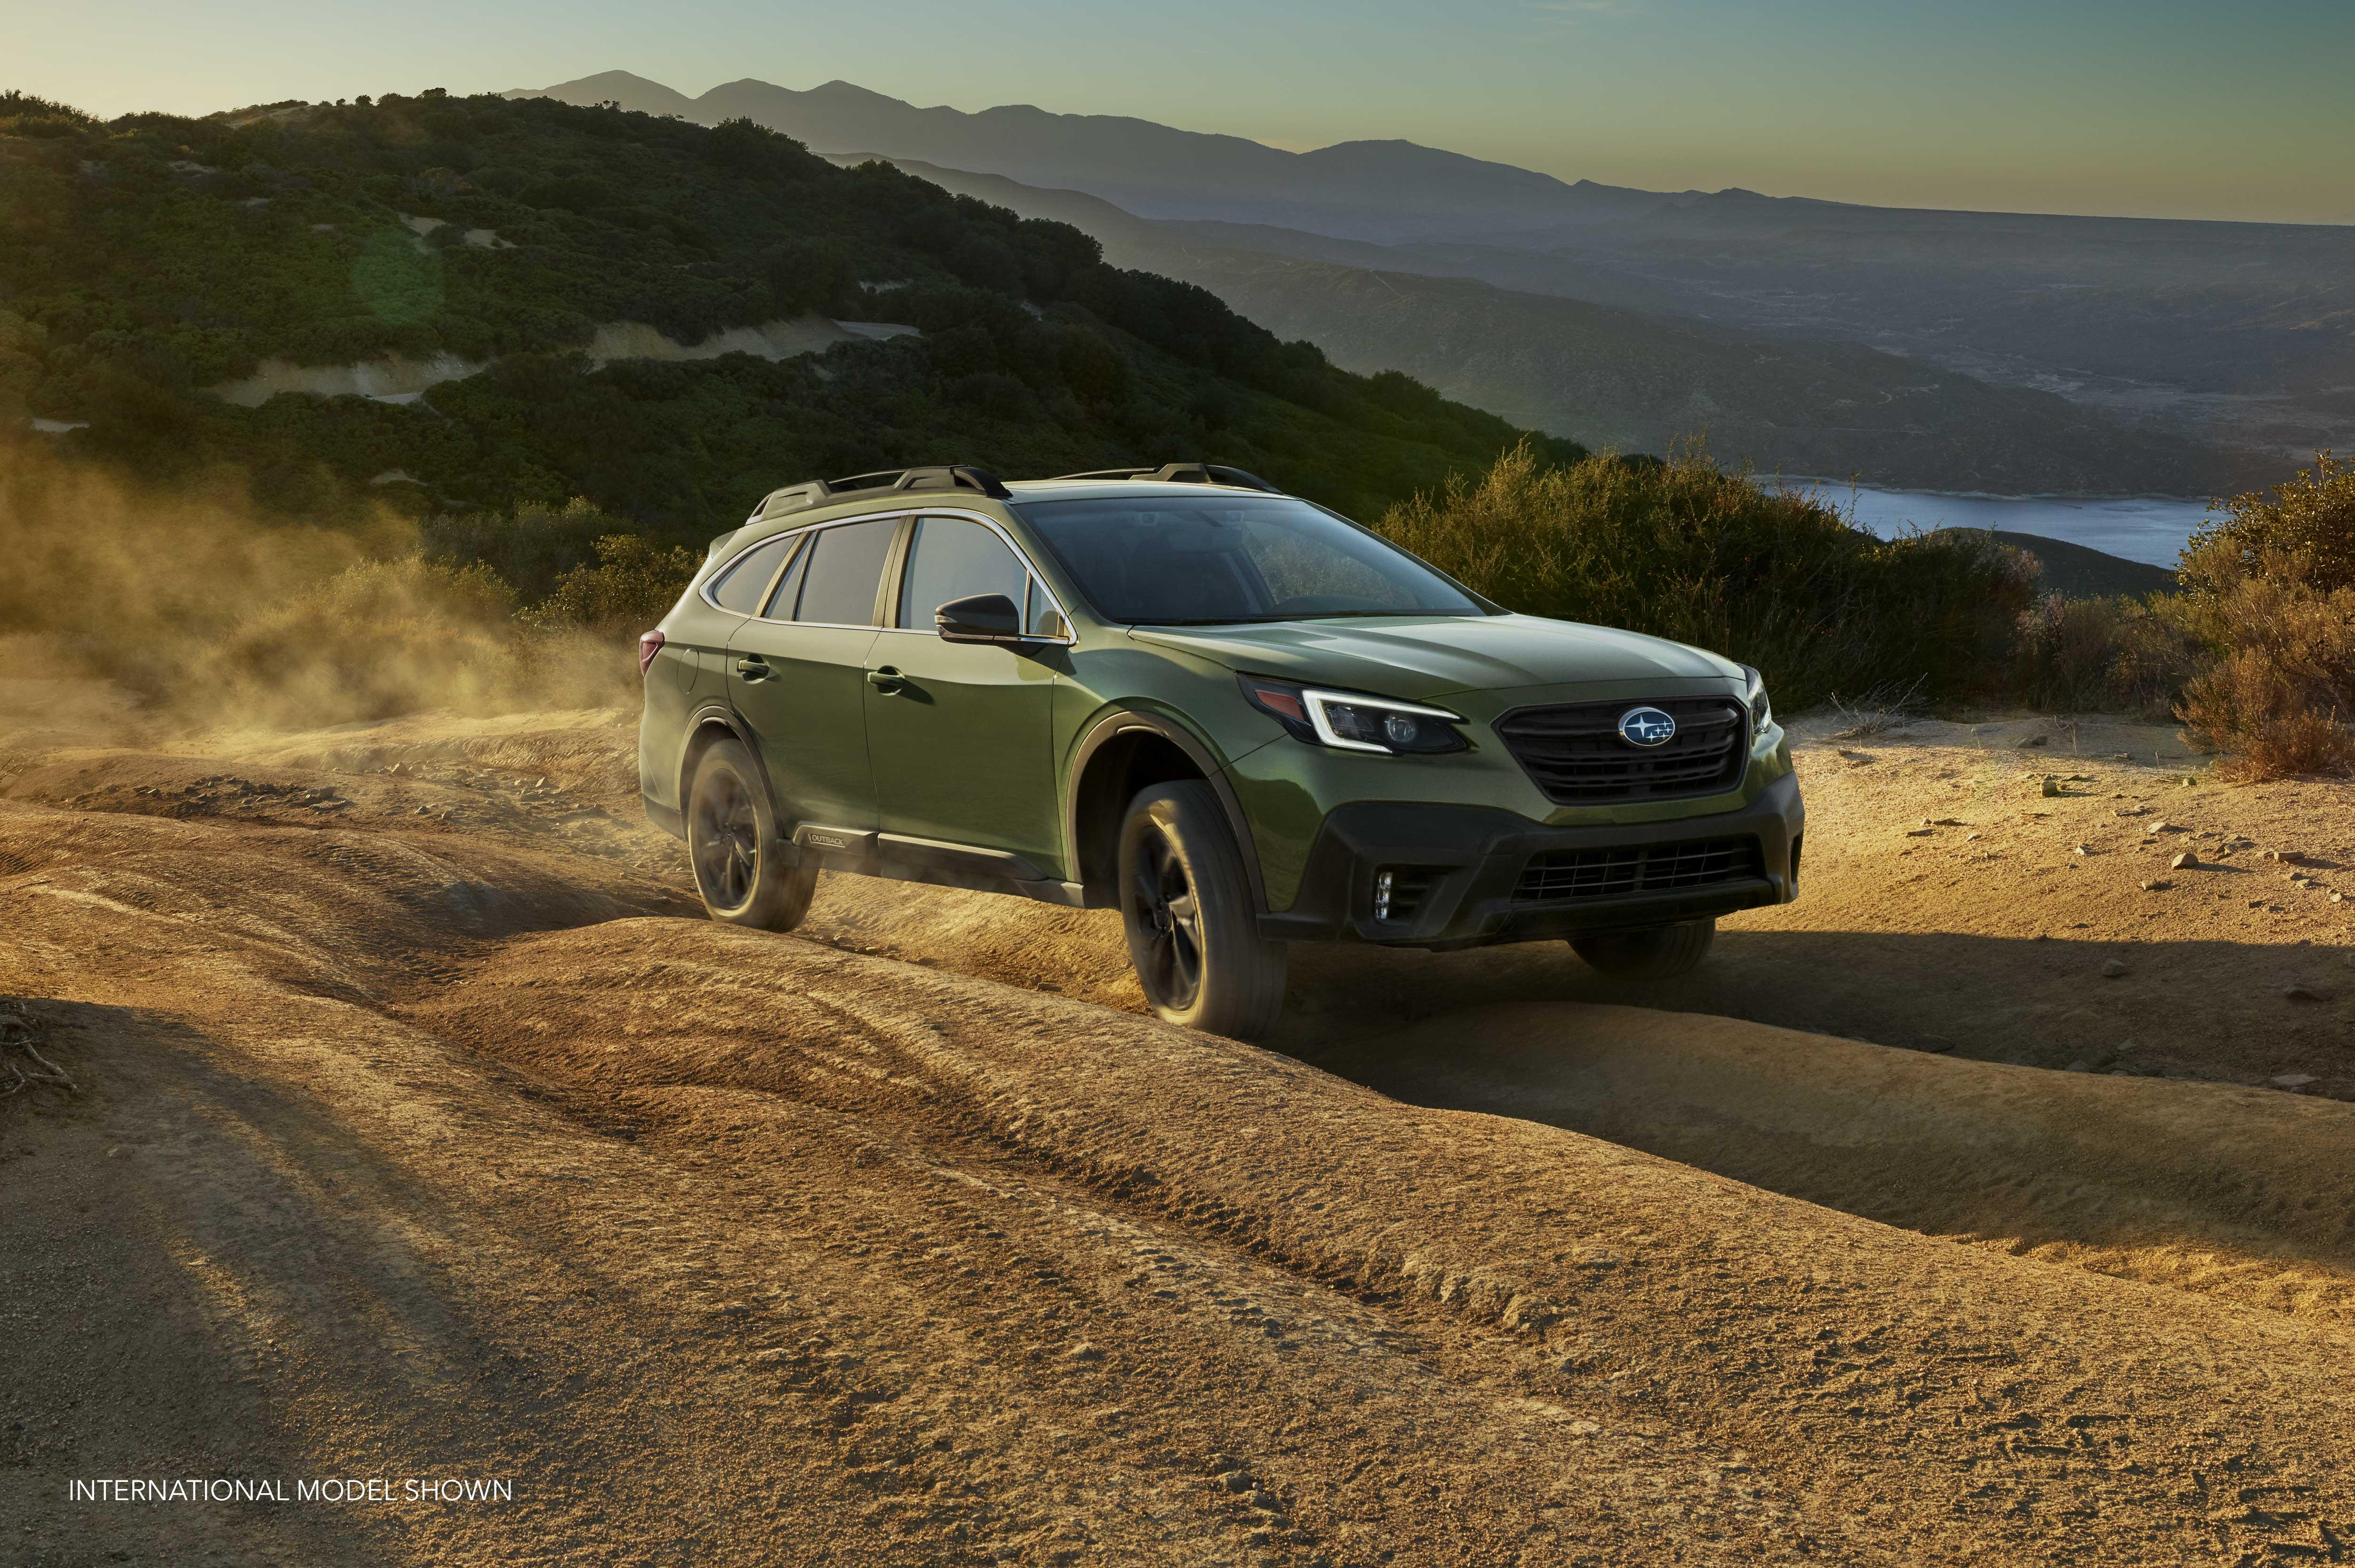 2020 Subaru Outback - Subaru Canada - Subaru Canada